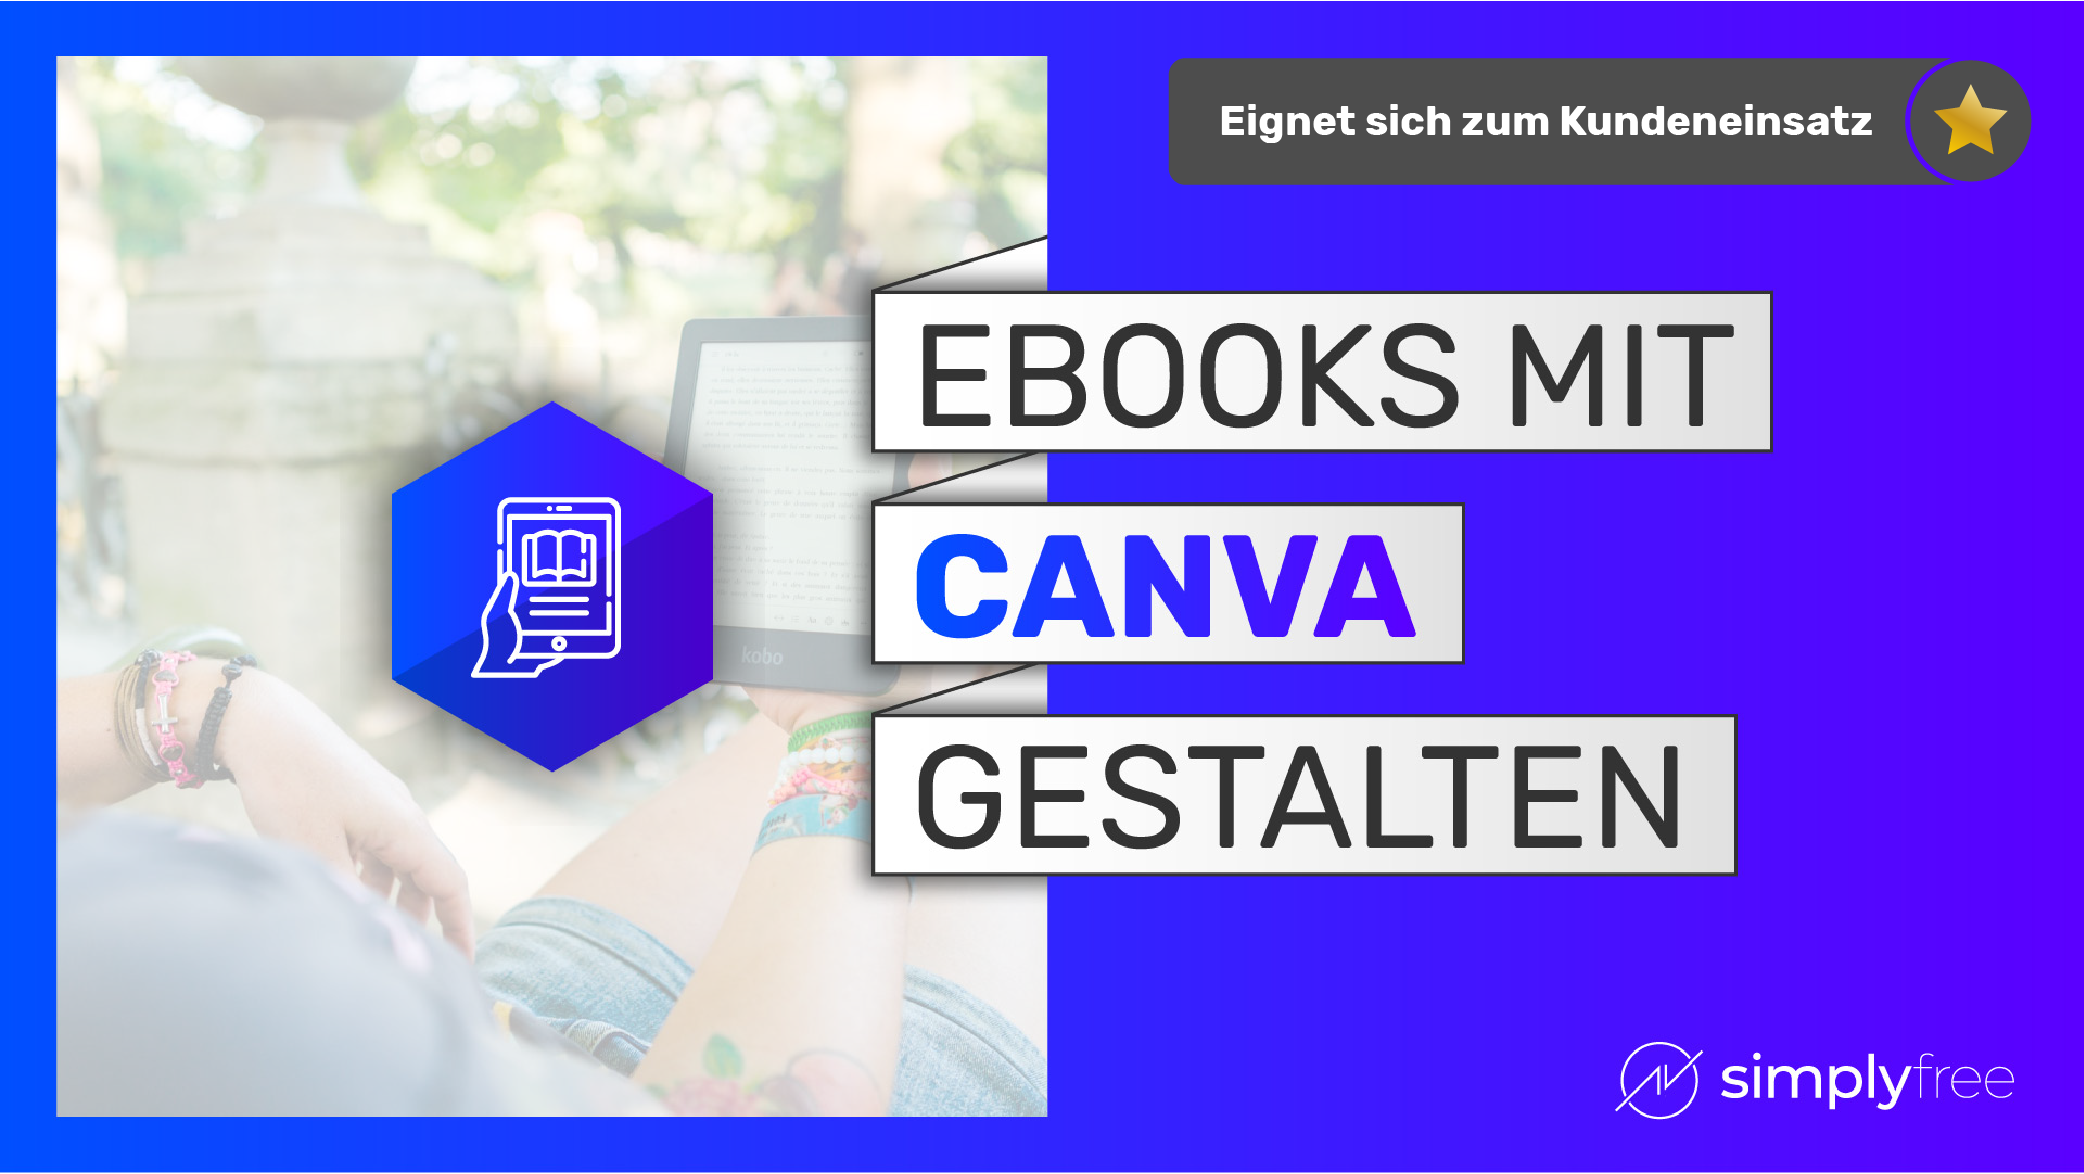 eBooks gestalten Canva